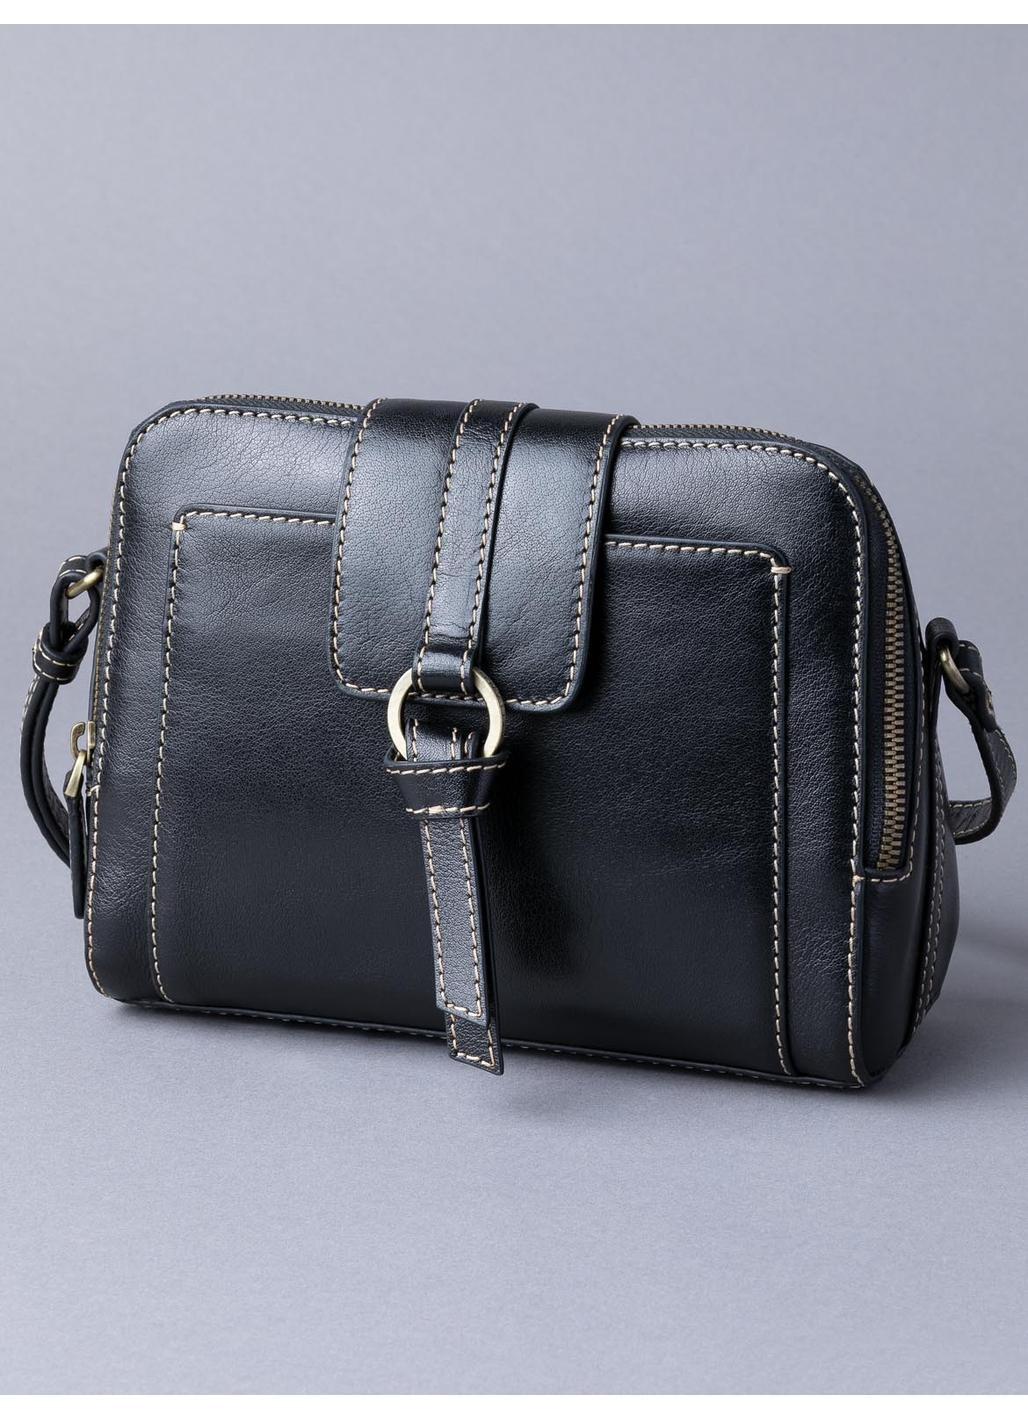 Birthwaite Leather Cross Body Bag in Black